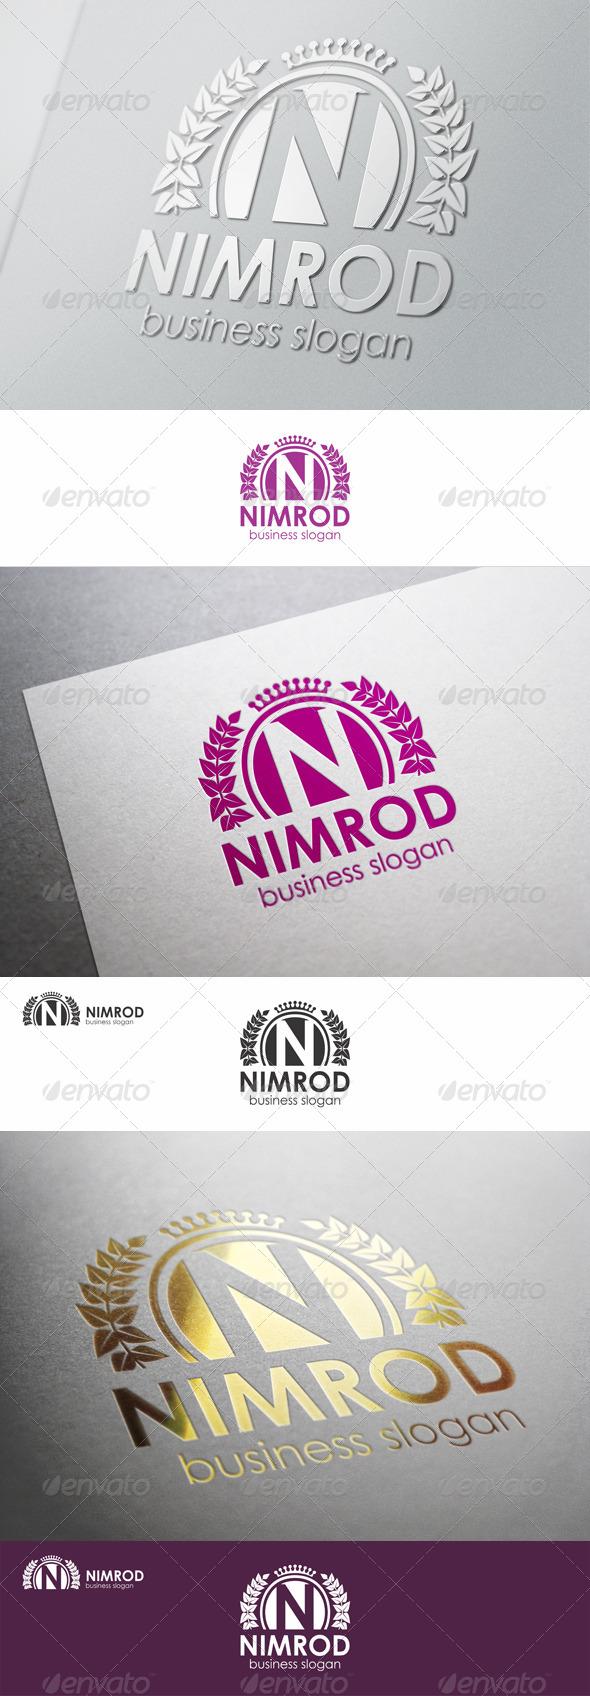 N Fashion Crest - Nimrod Logo Template - Crests Logo Templates